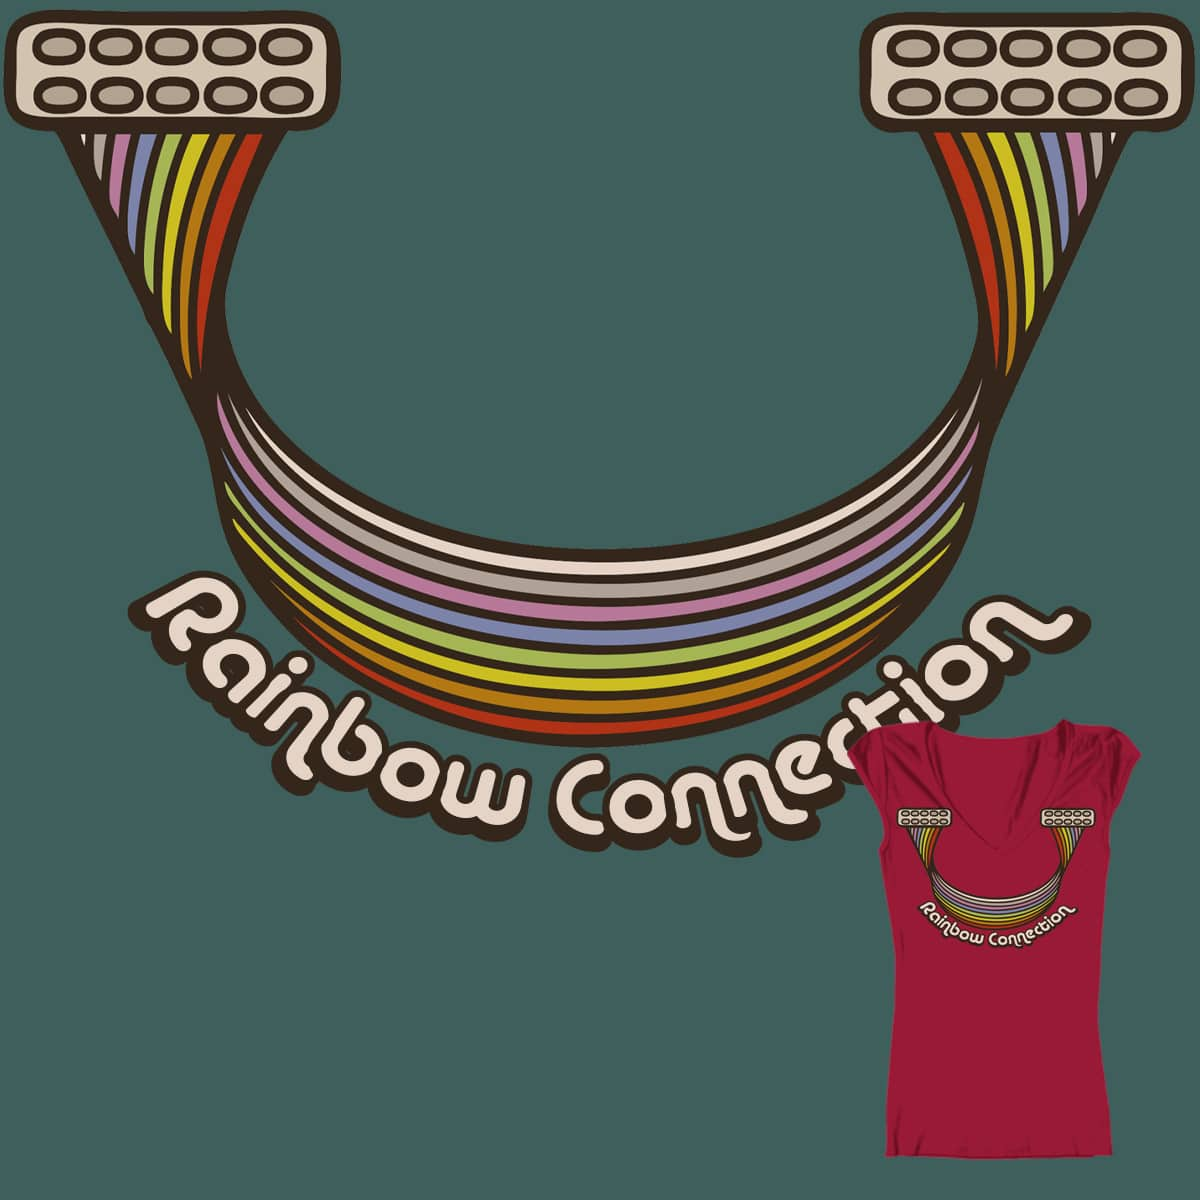 Rainbow Connection by kagry on Threadless